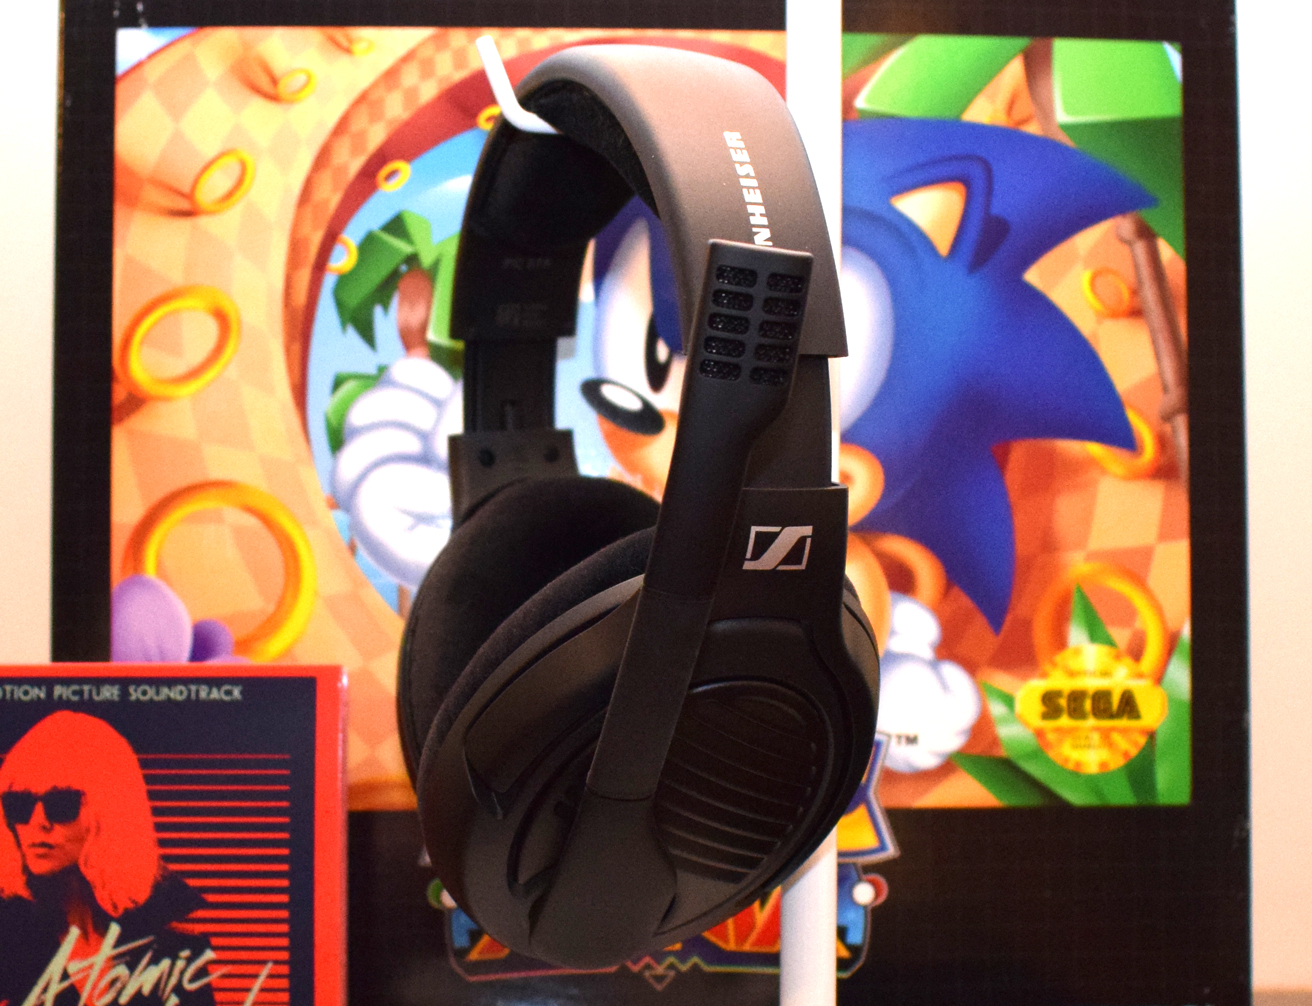 Massdrop x Sennheiser PC37X Gaming Headset Review Mic